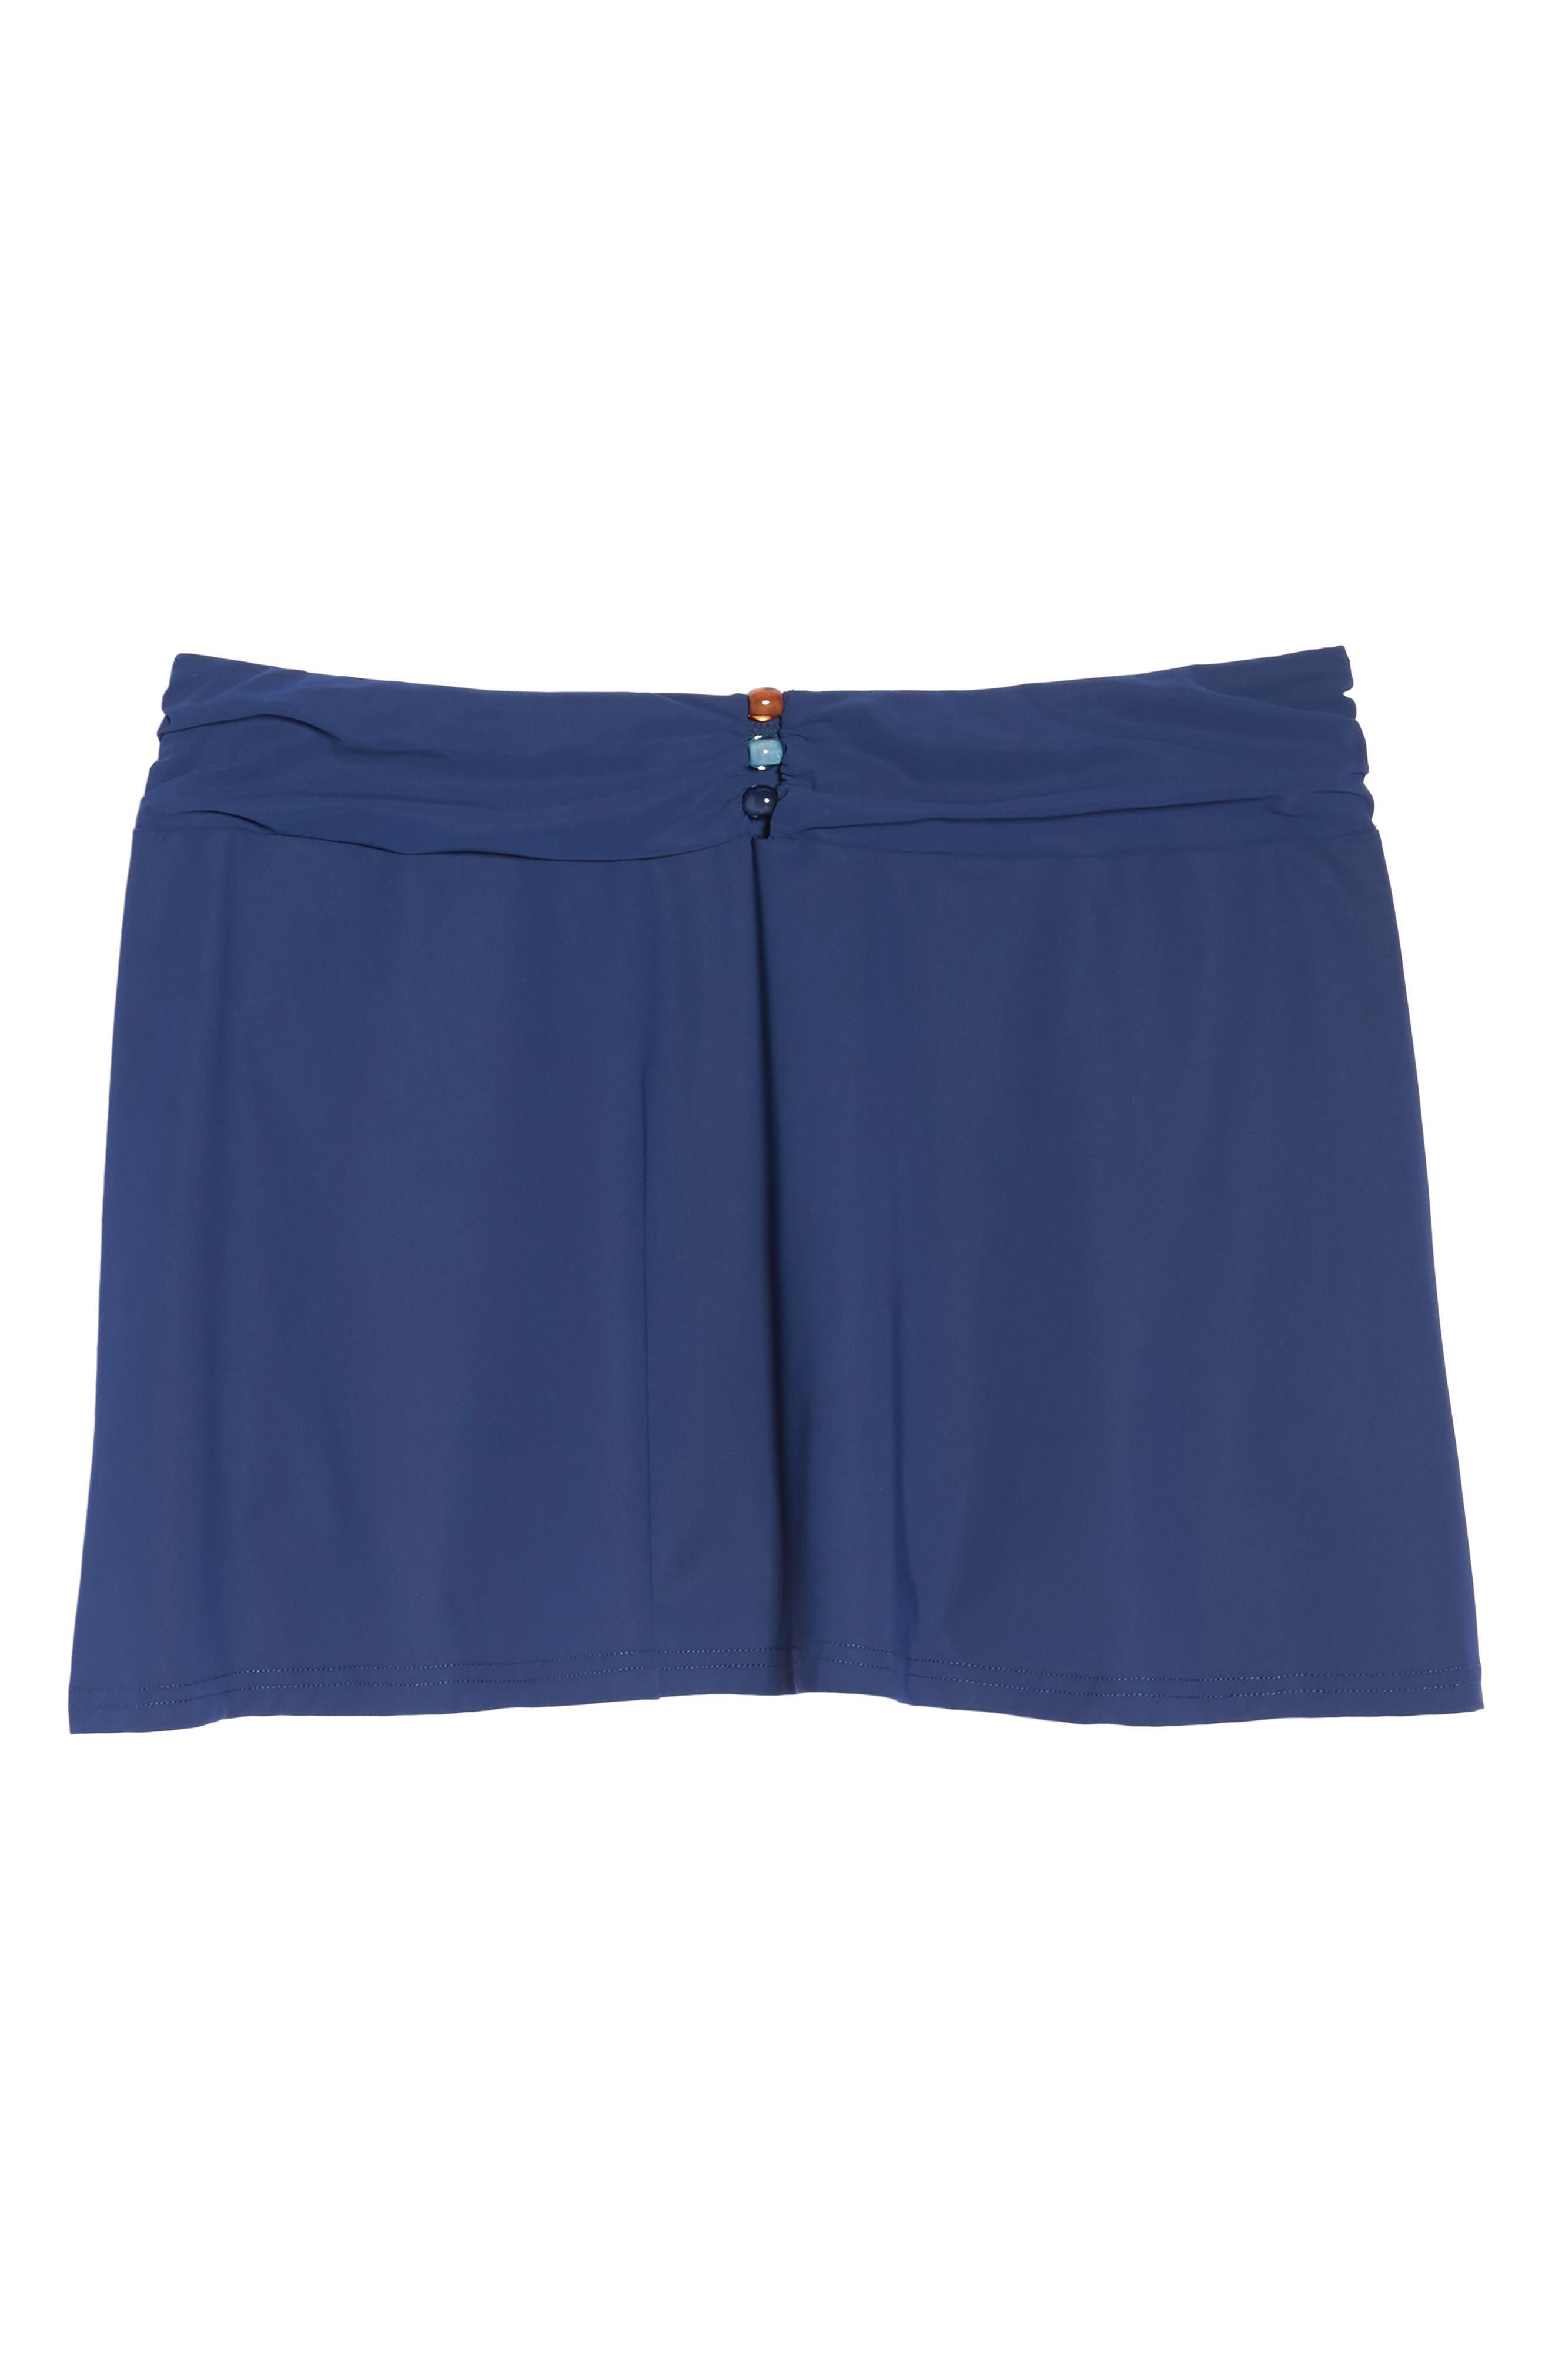 Beaded Cover-Up Skirt,                             Alternate thumbnail 6, color,                             PETROL